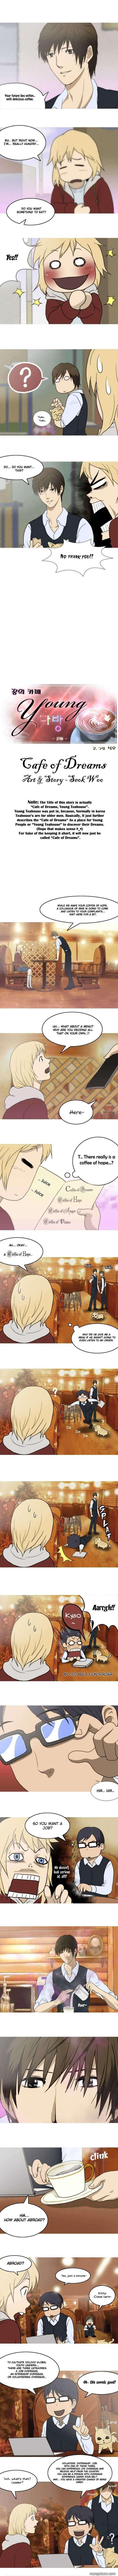 Cafe Of Dreams 2 Page 1